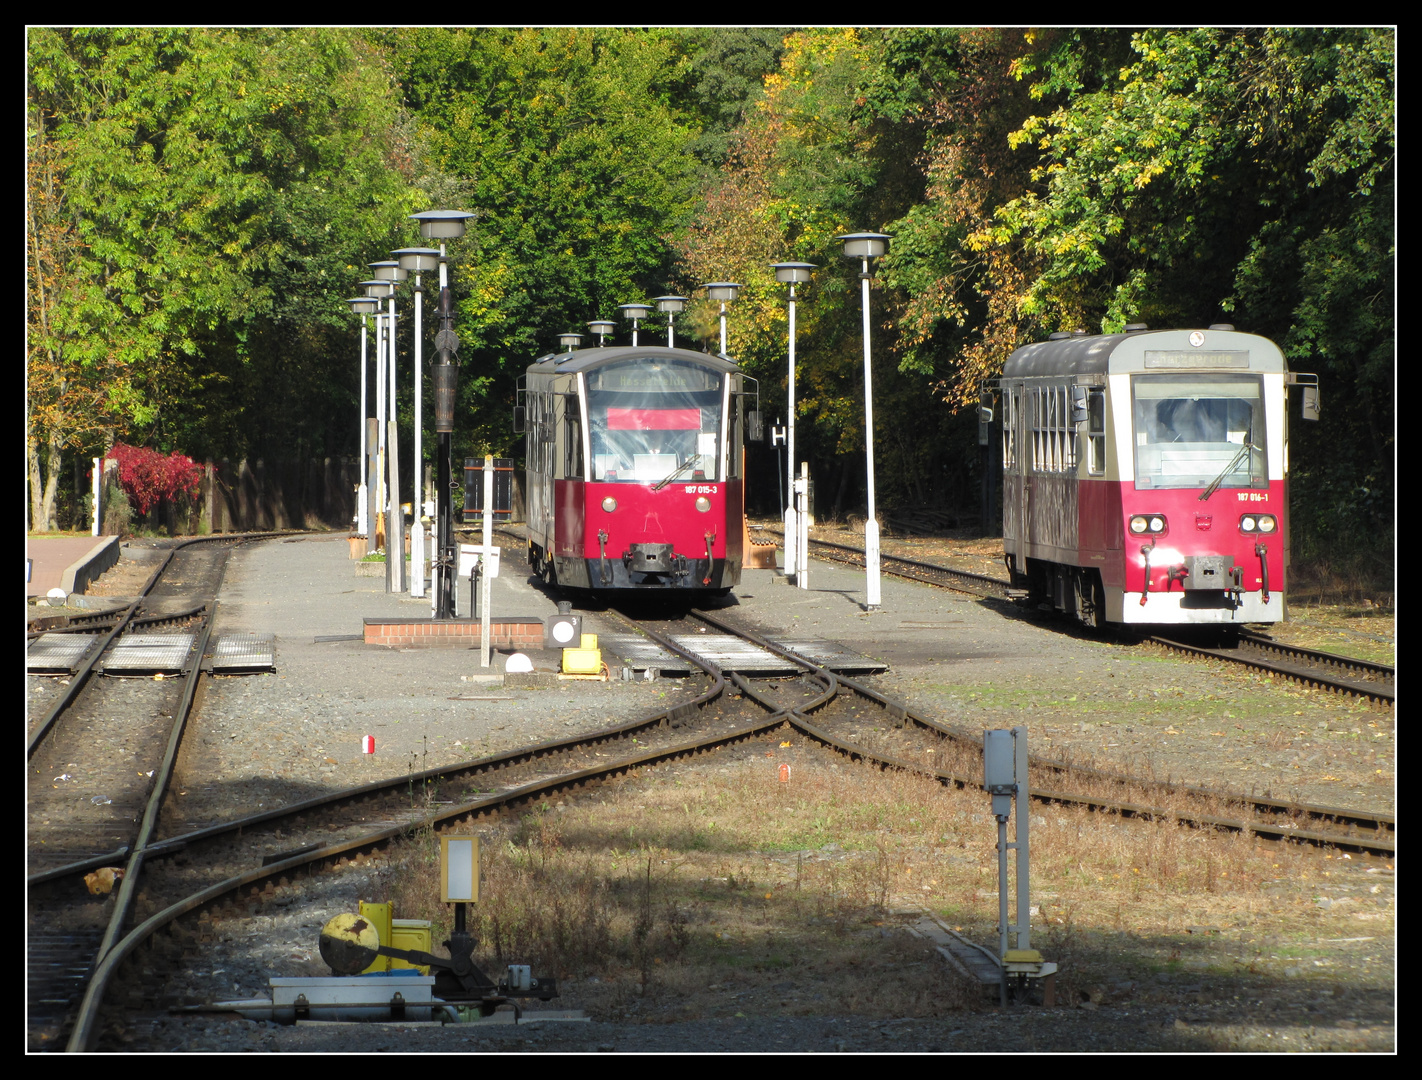 Zugkreuzung in Alexisbad